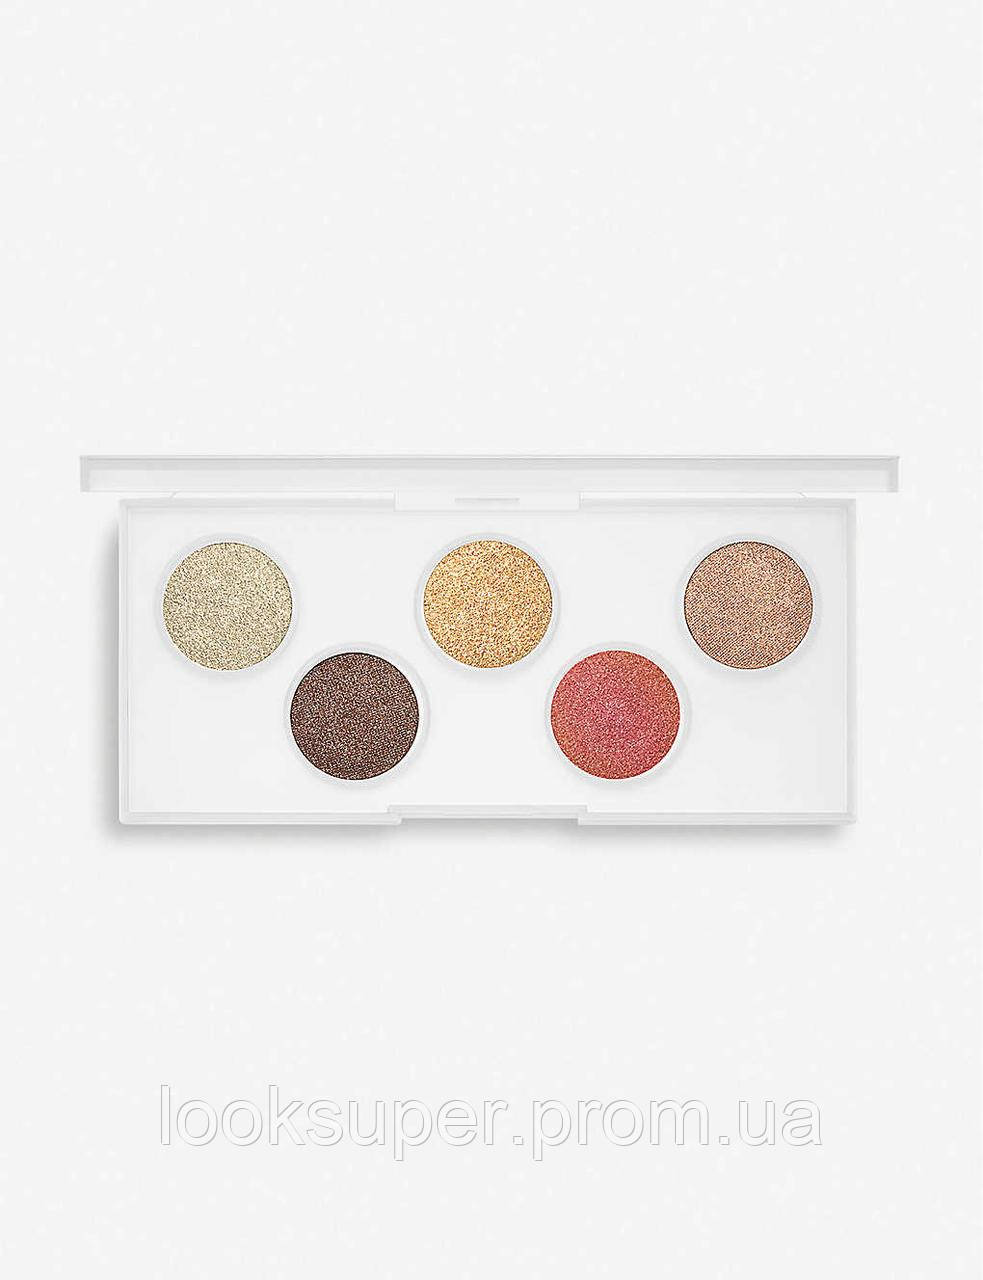 Палетка Pat McGrath Labs Sublime eyeshadow palette